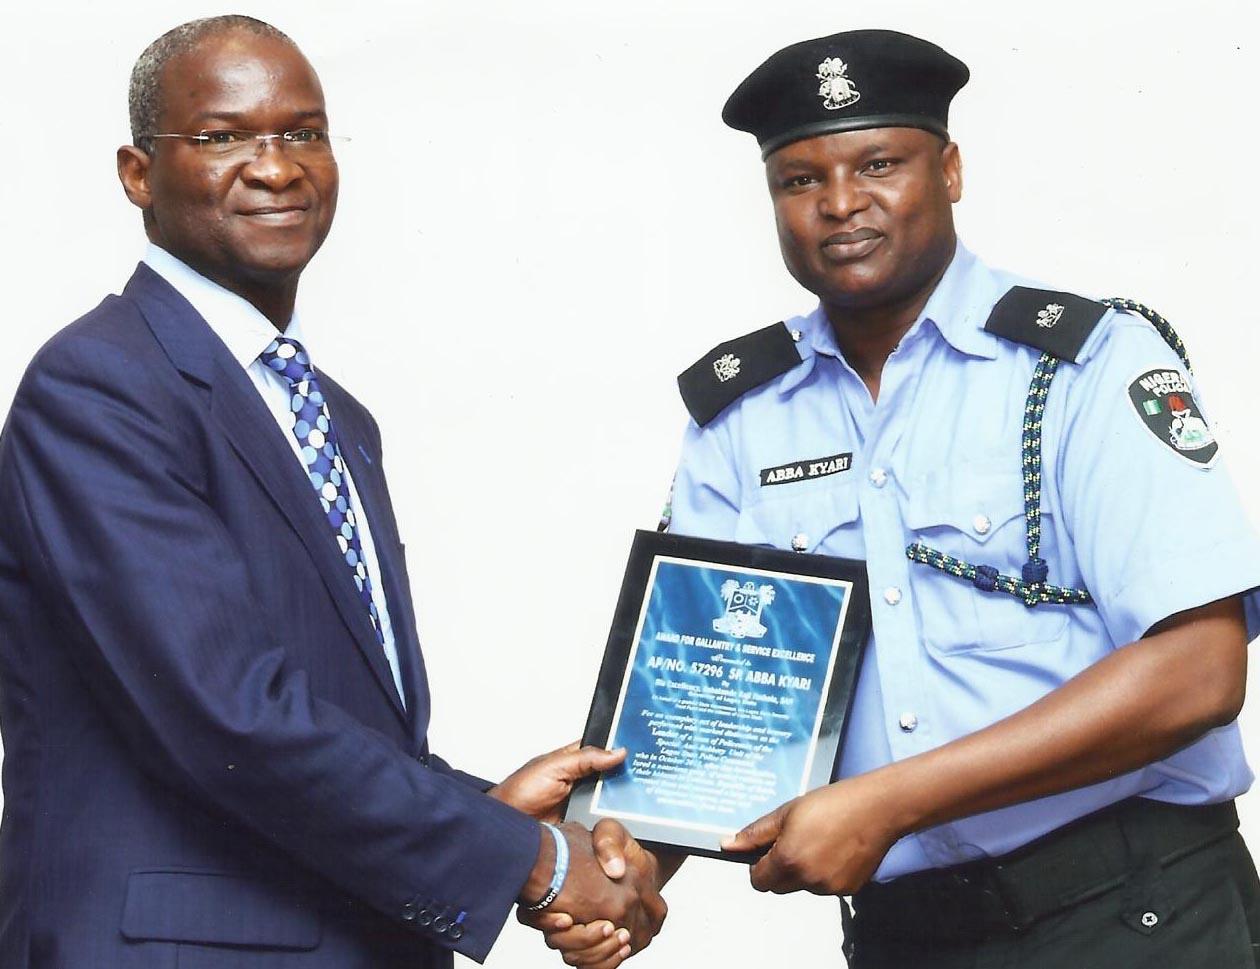 Abba Kyari: Officer extraordinaire